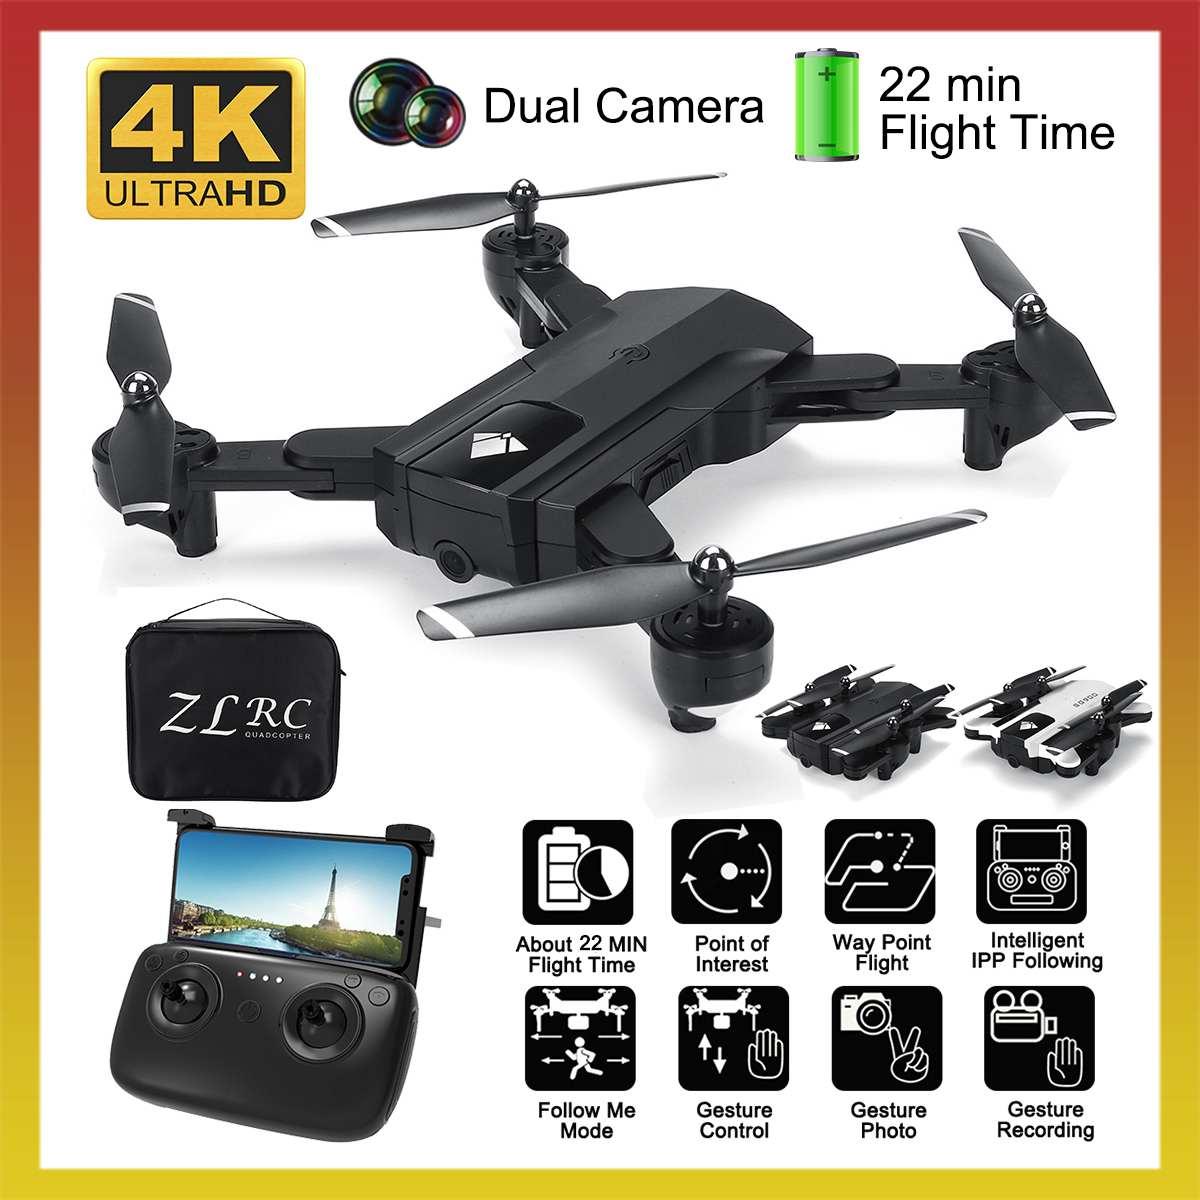 SG900 Wifi RC Drone 4K HD 1080P Cámara Dual drone GPS Me sigue giroscopio FPV Drone profesional larga vida de batería drones